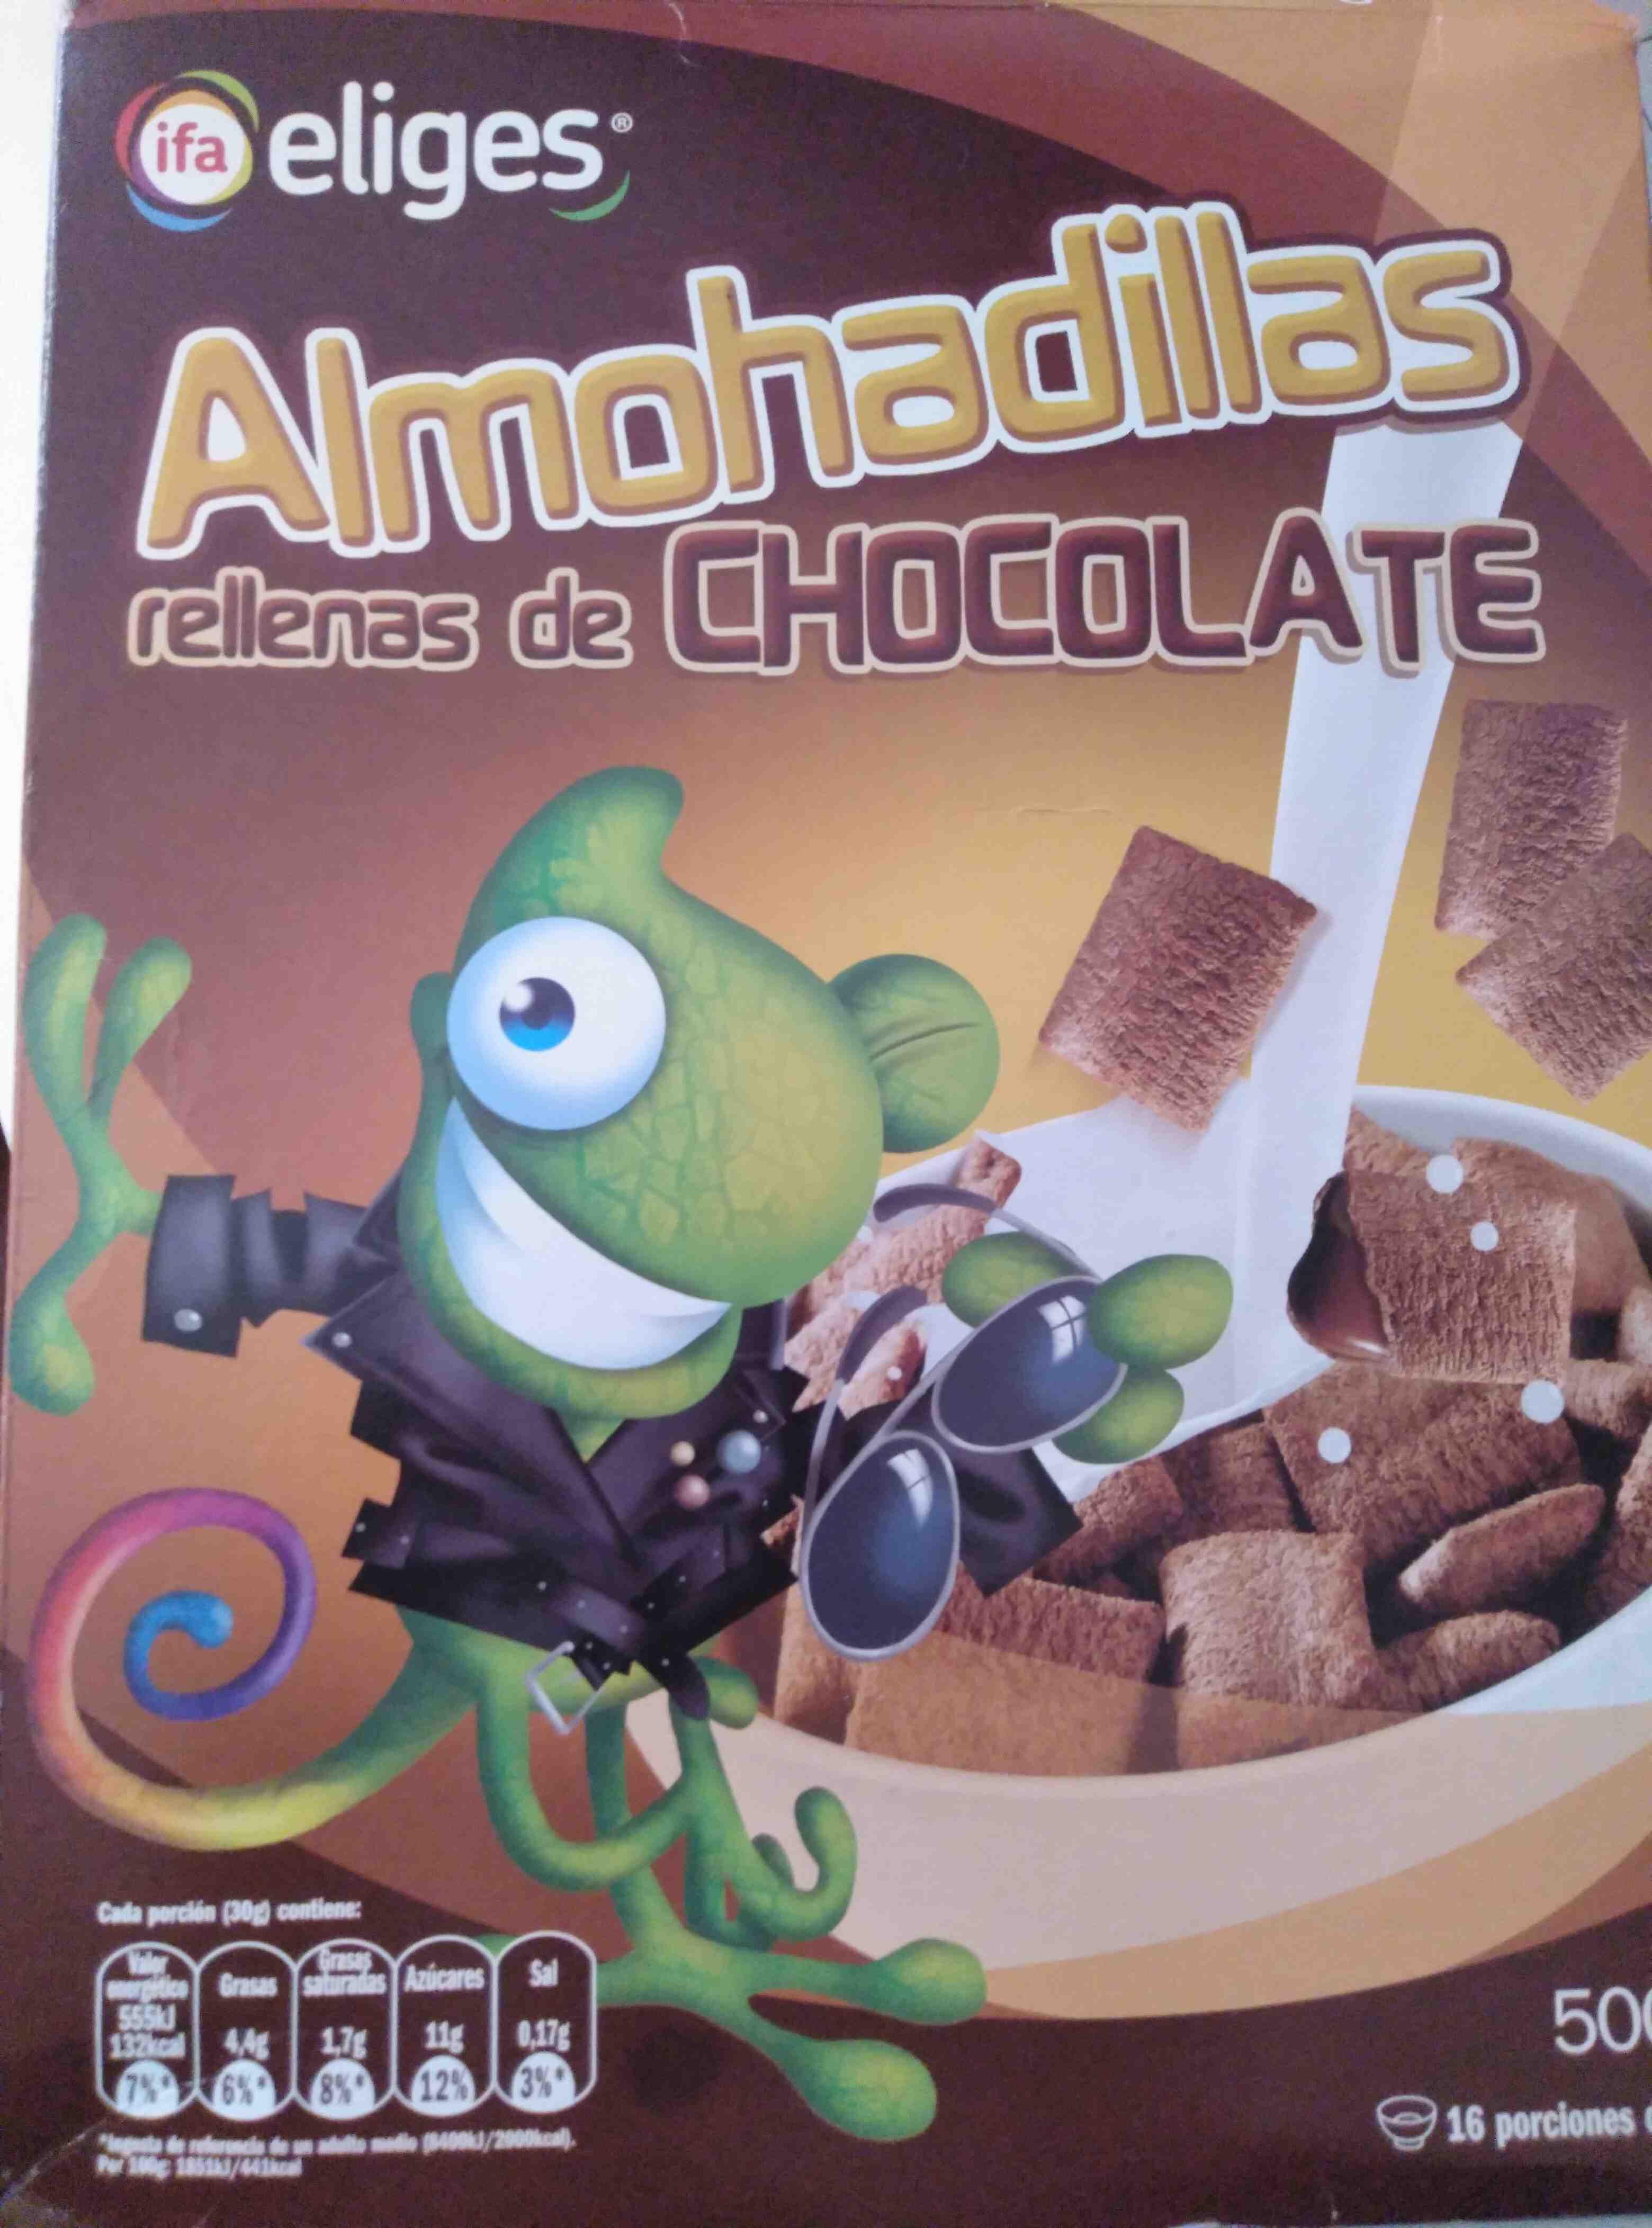 Cereales Almohadillas Choco. 500 G. ifa Eliges - Producte